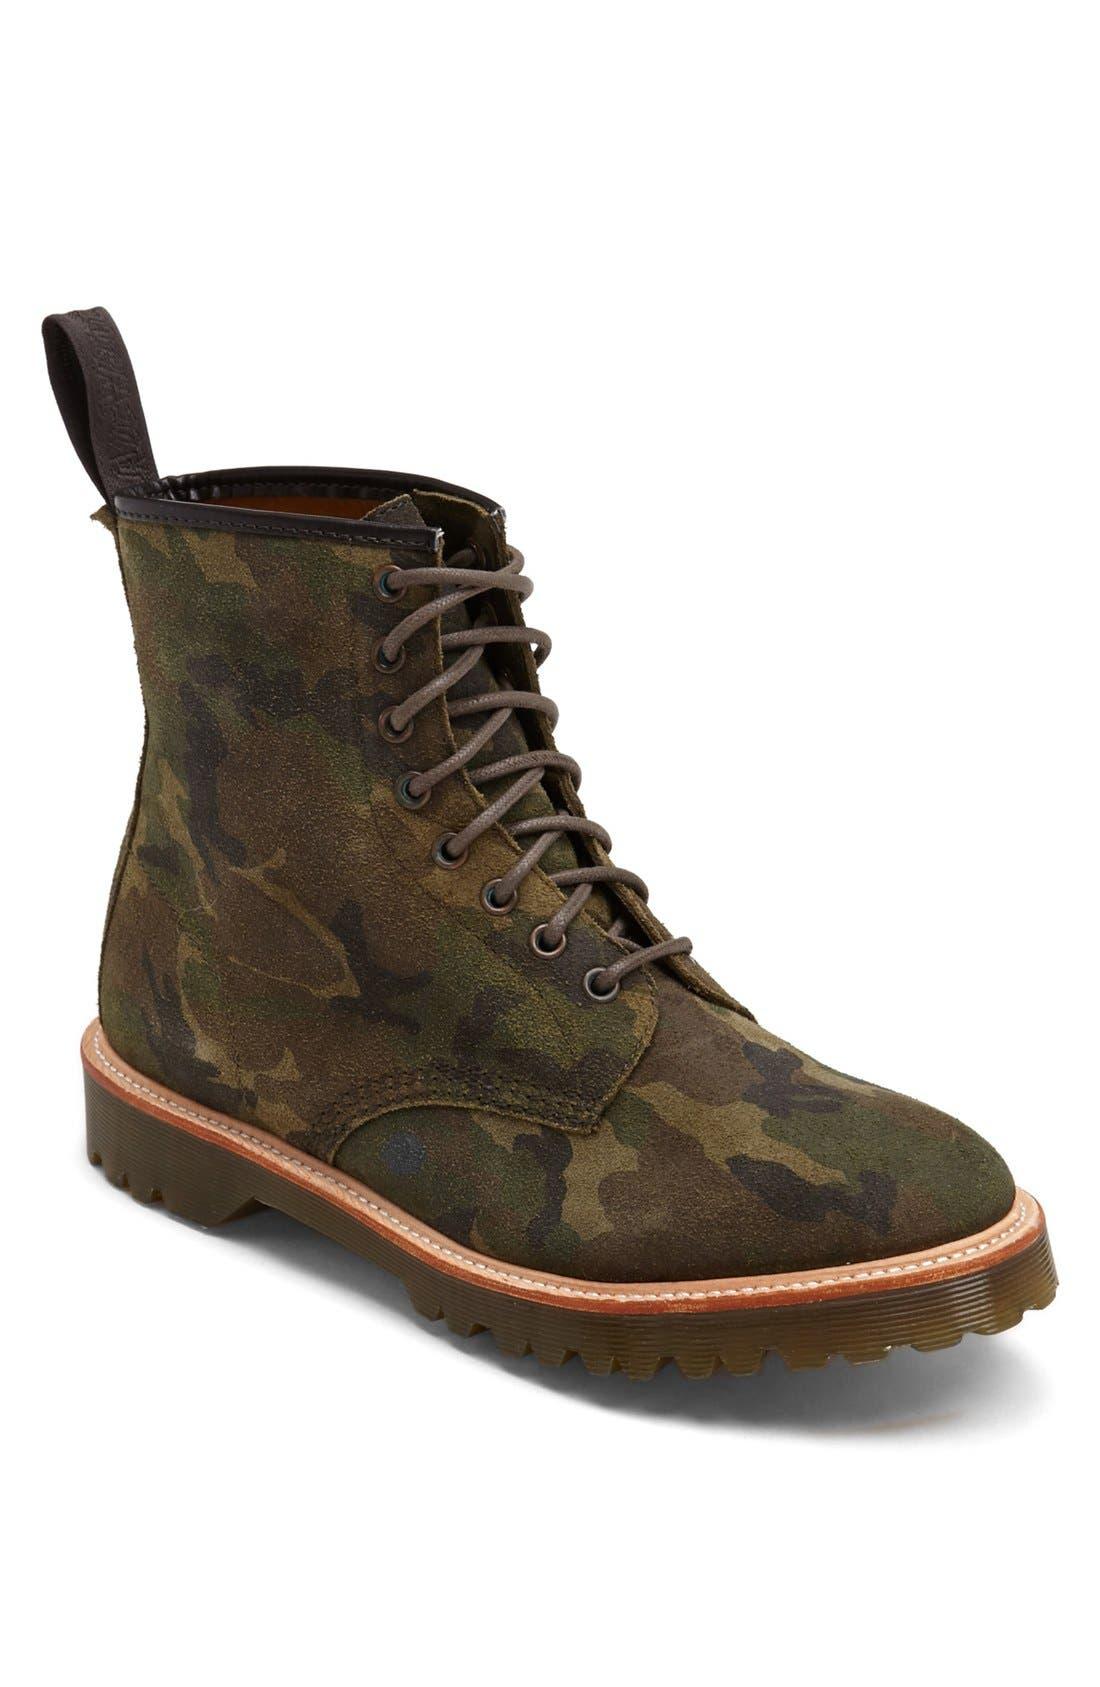 Alternate Image 1 Selected - Dr. Martens 'Original 1460' Boot